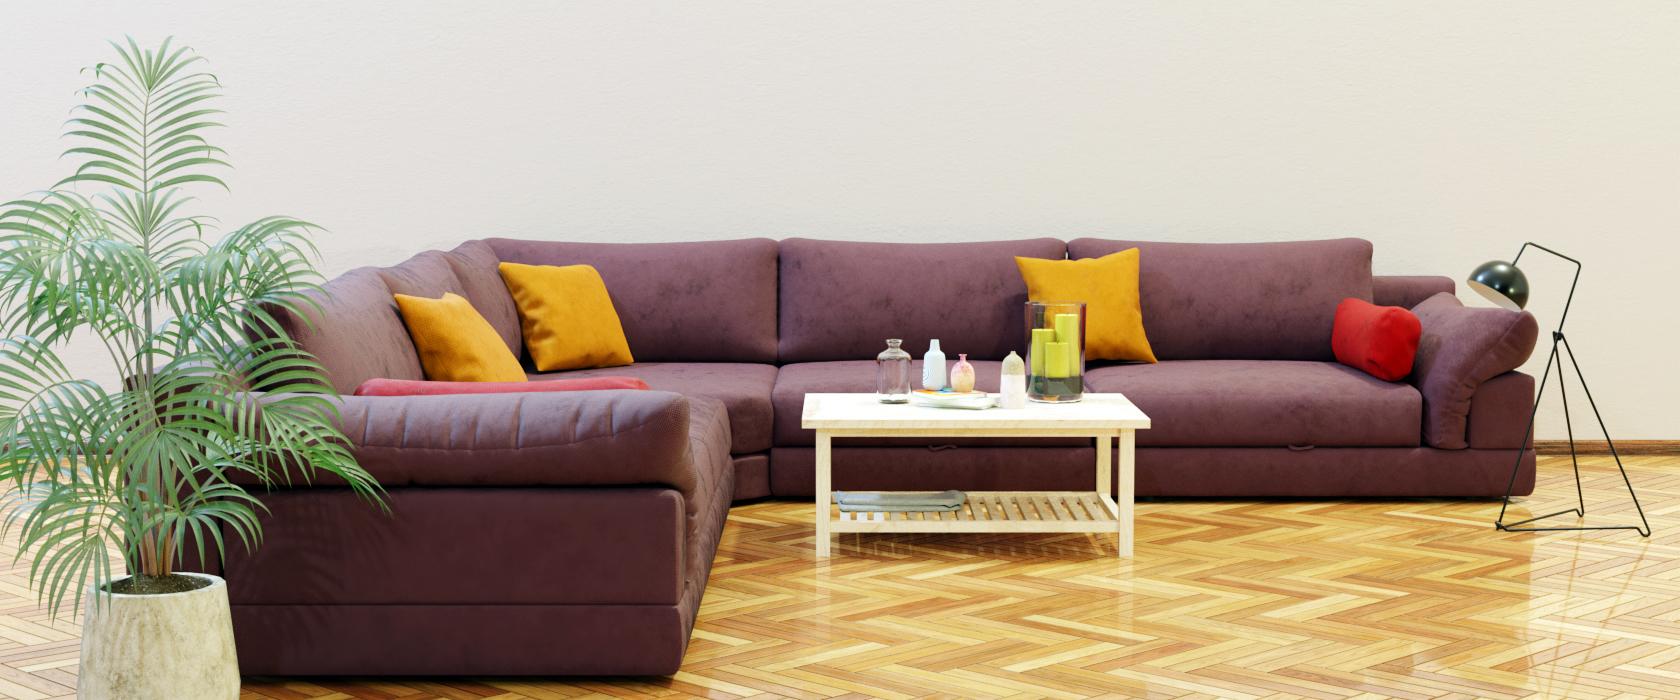 Модульний диван Claudia 355x355 - Фото 2 - Pufetto